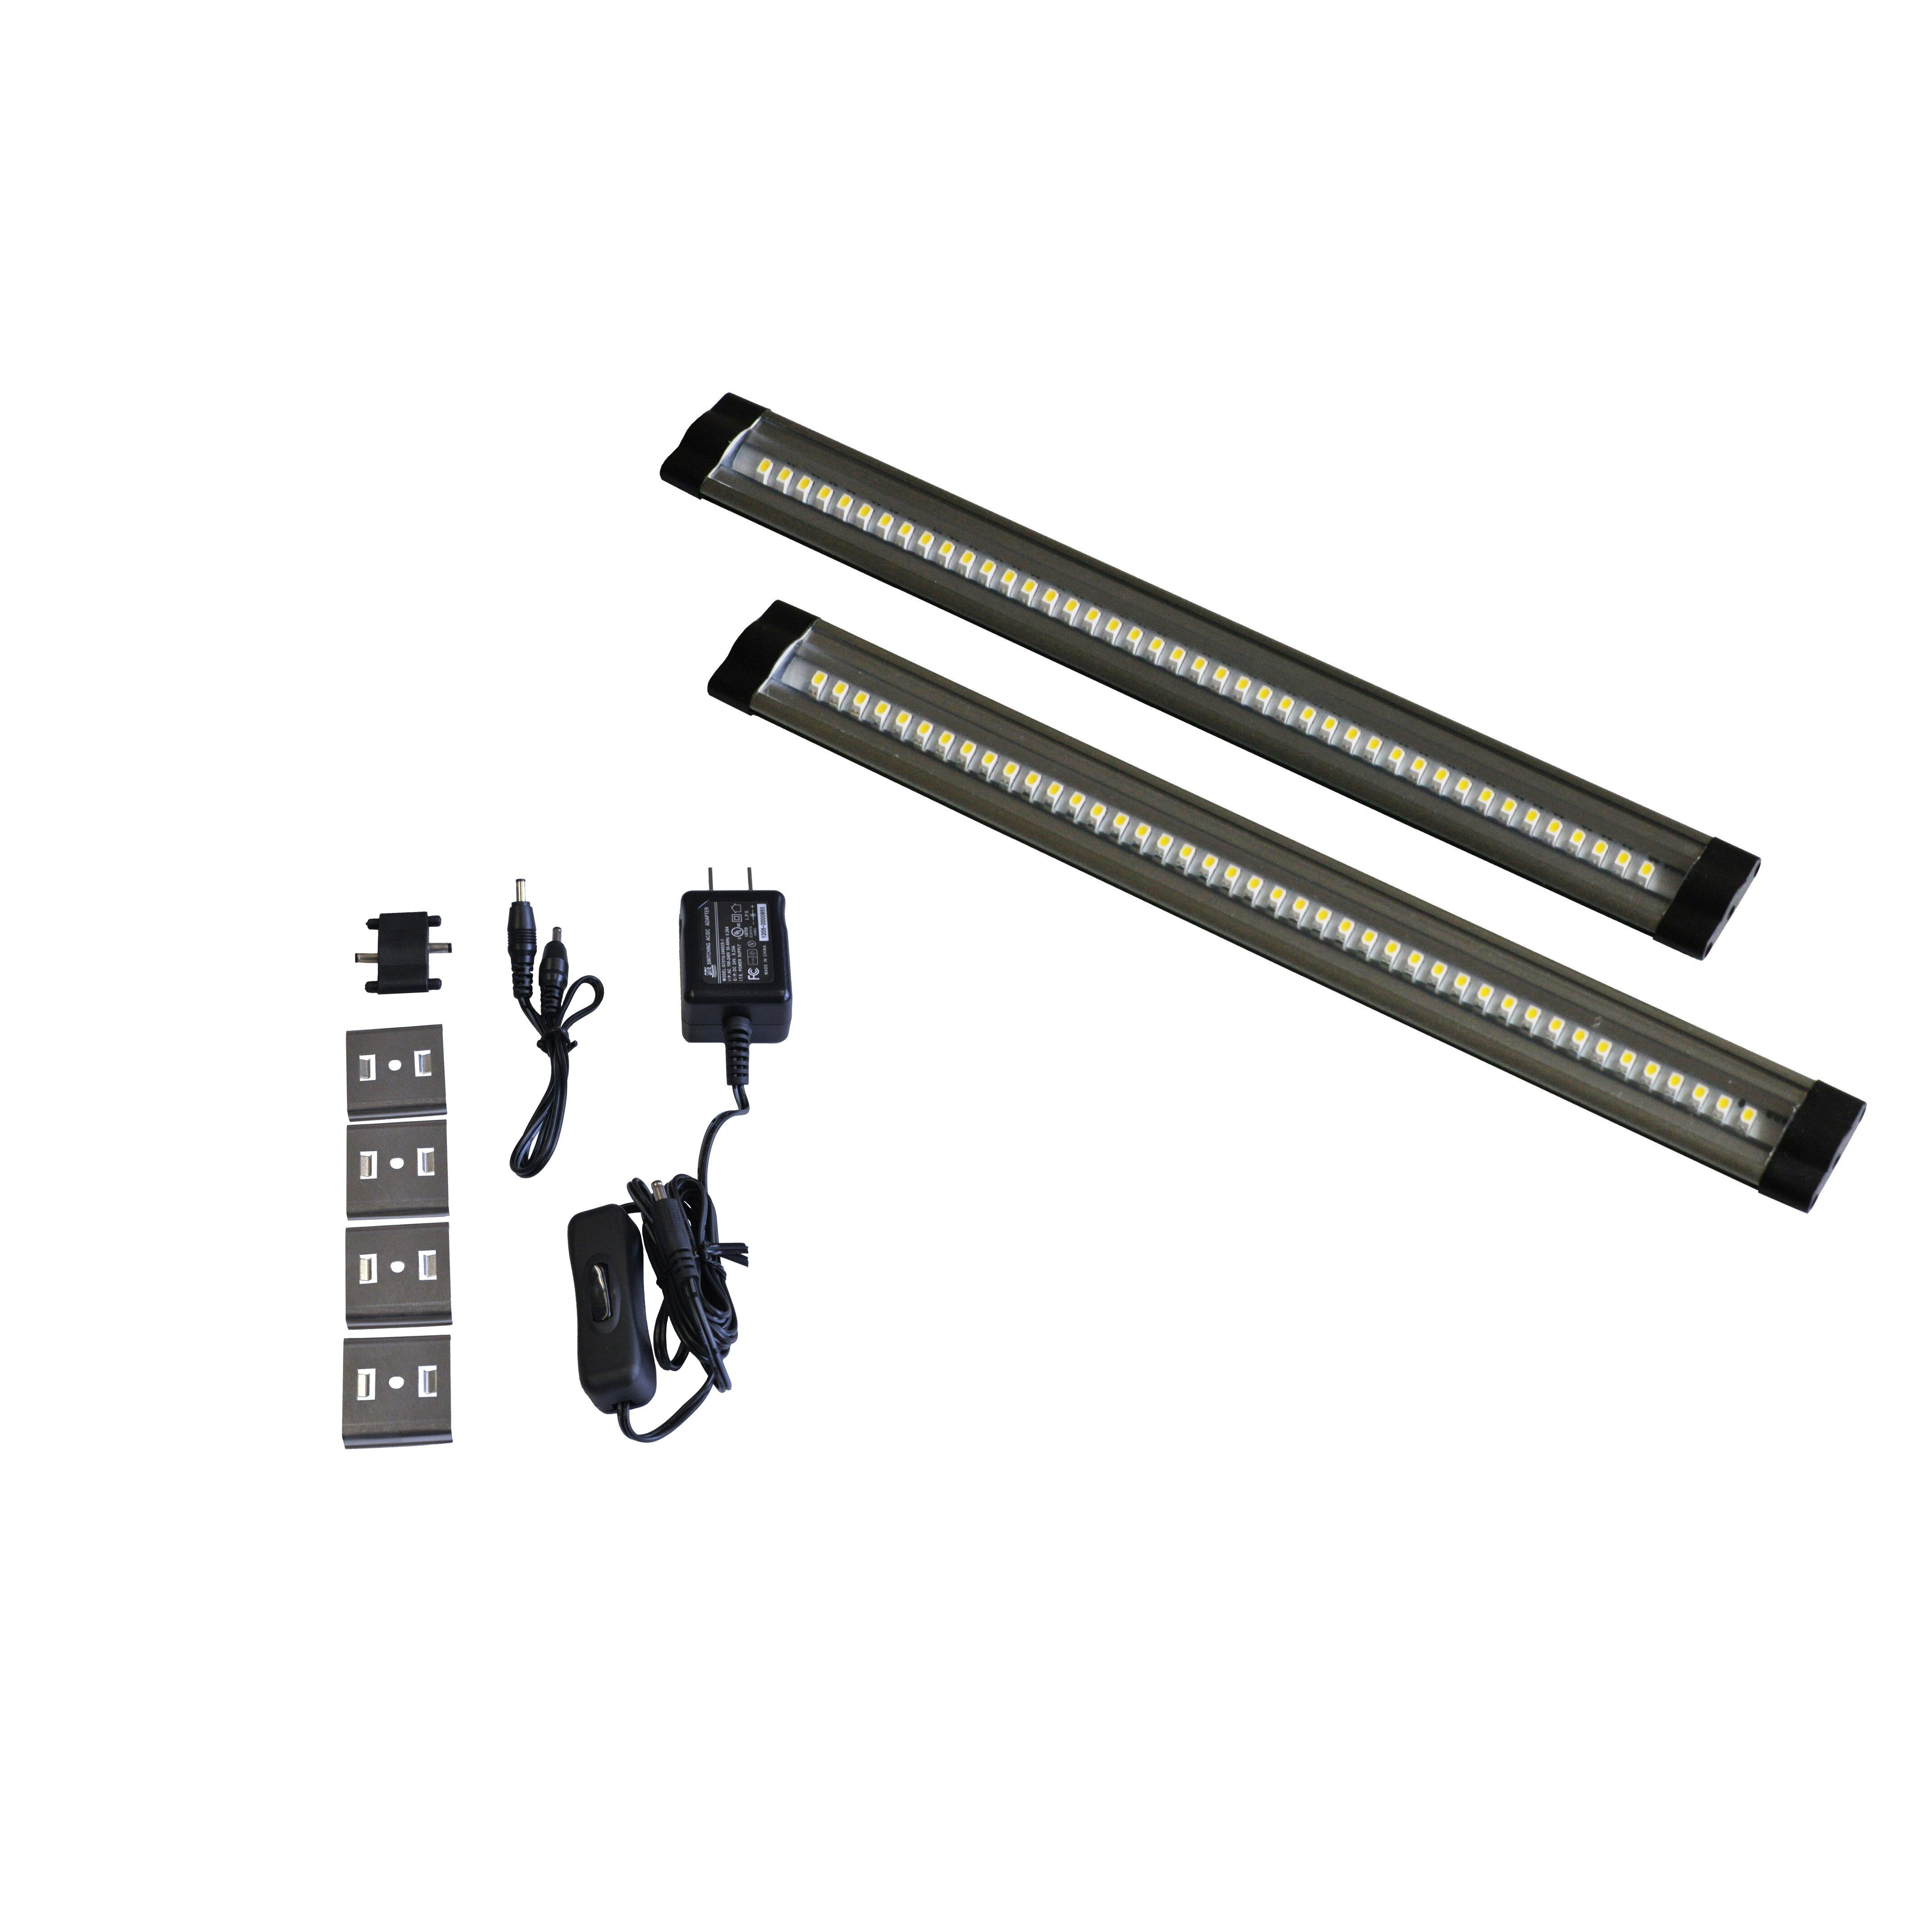 "24 Led Under Cabinet Strip Light: Radionic Hi Tech Eco 24"" LED Under Cabinet Strip Light"